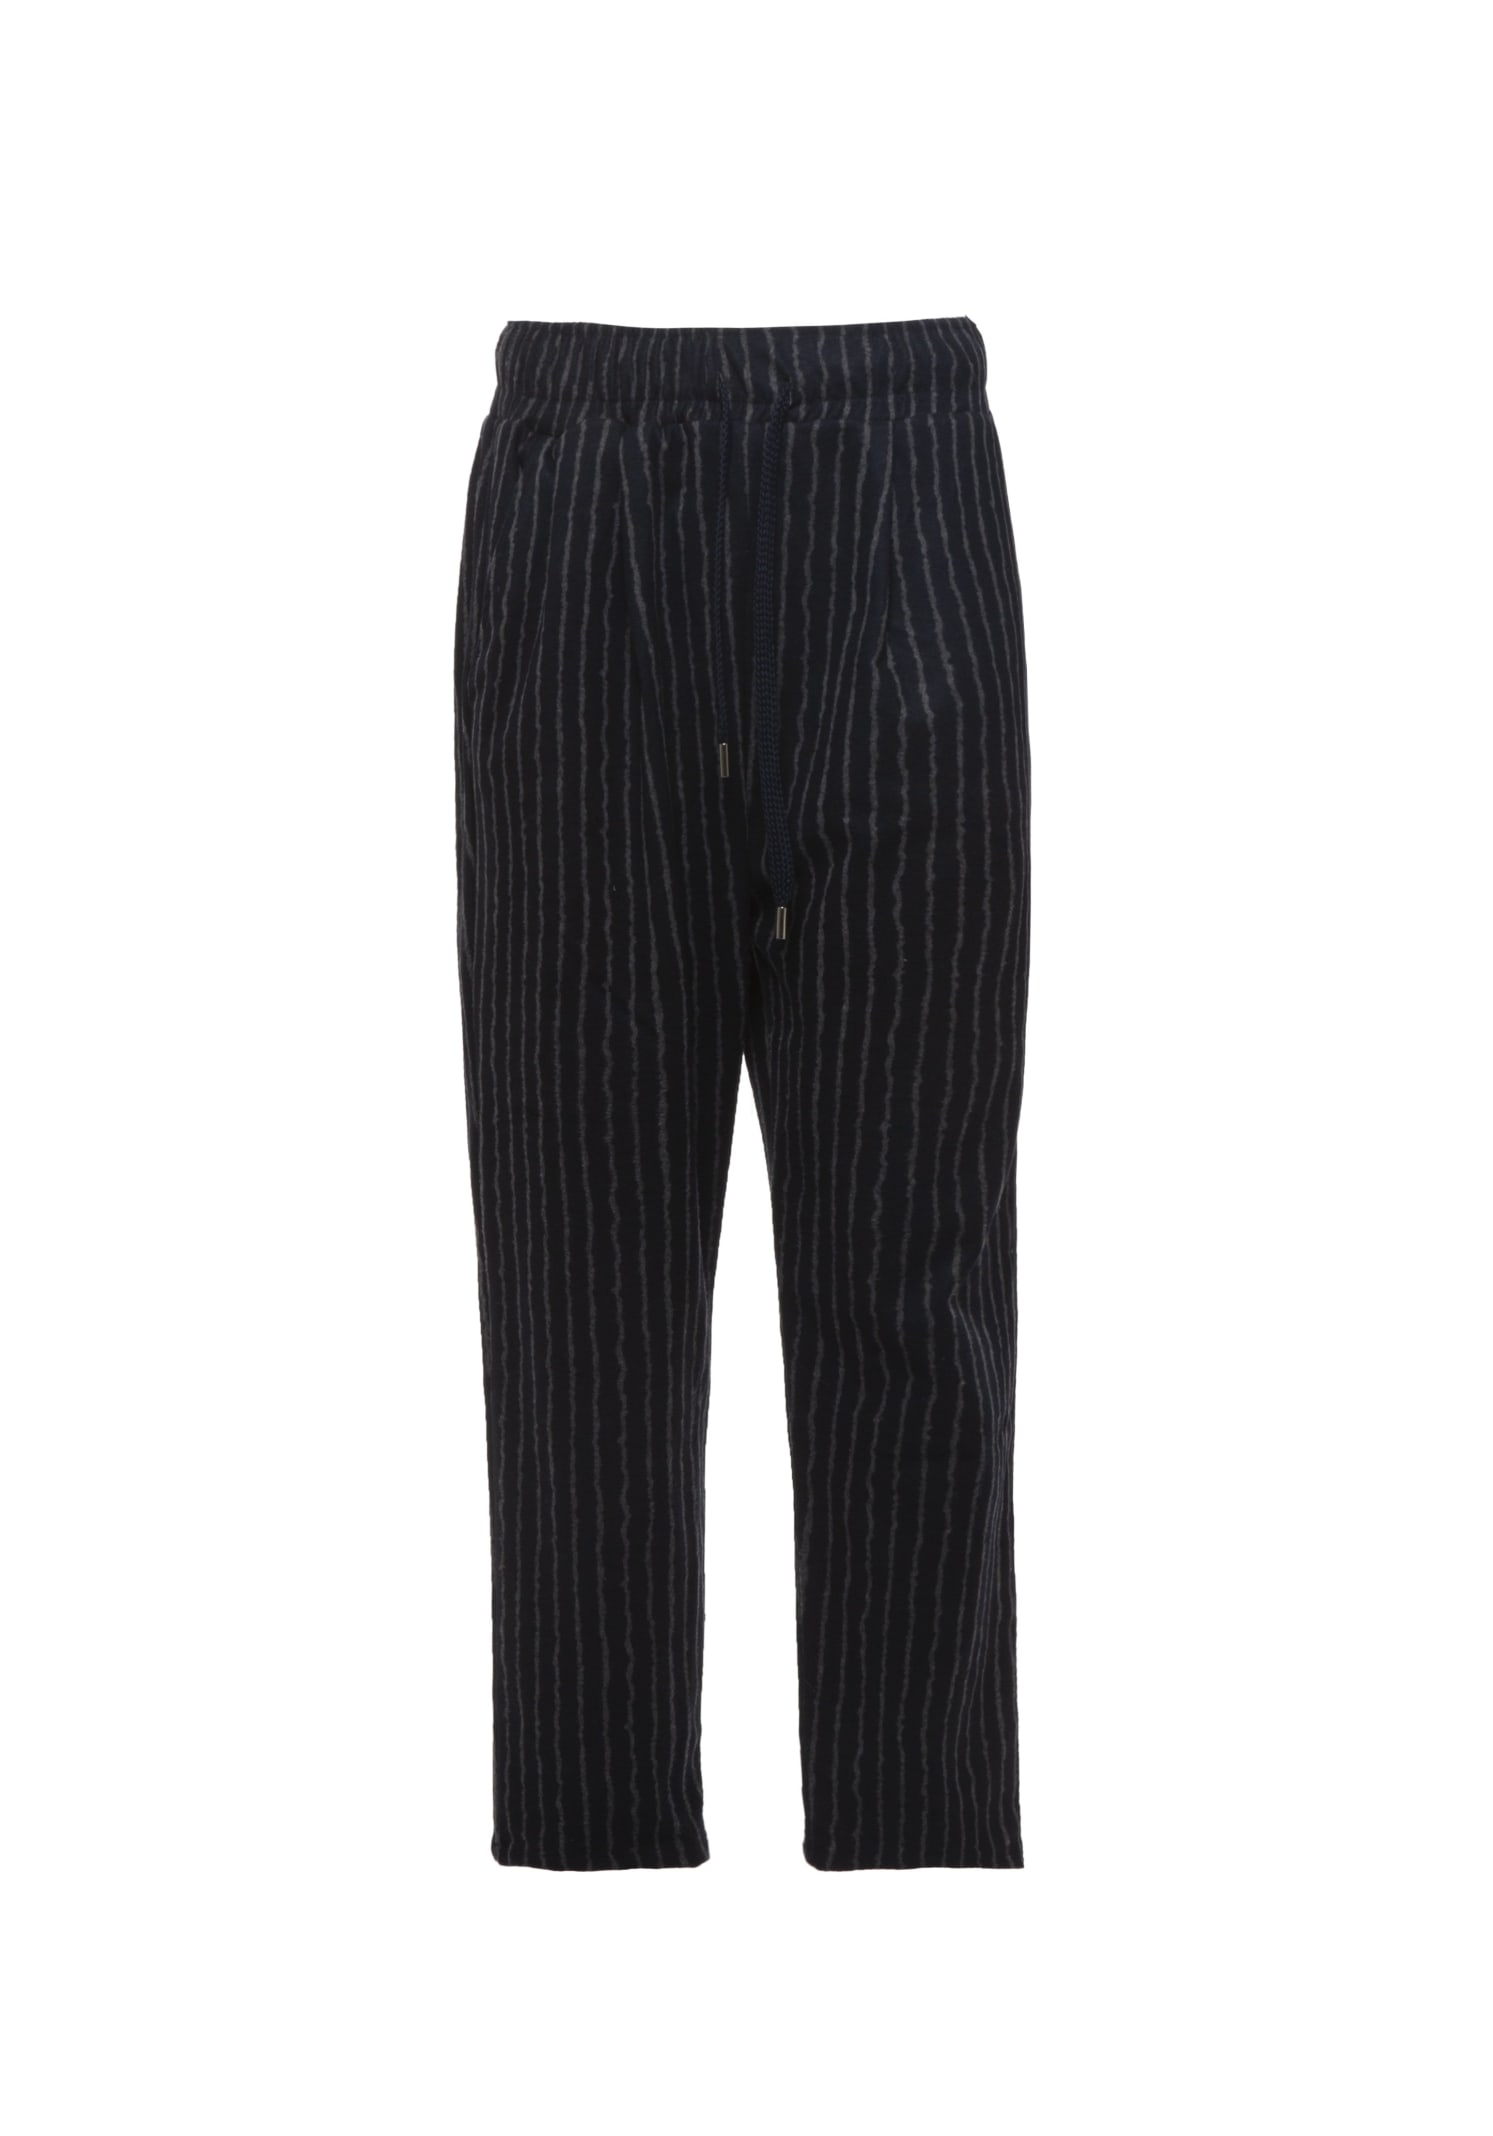 Pants Chino Striped Grey Blue